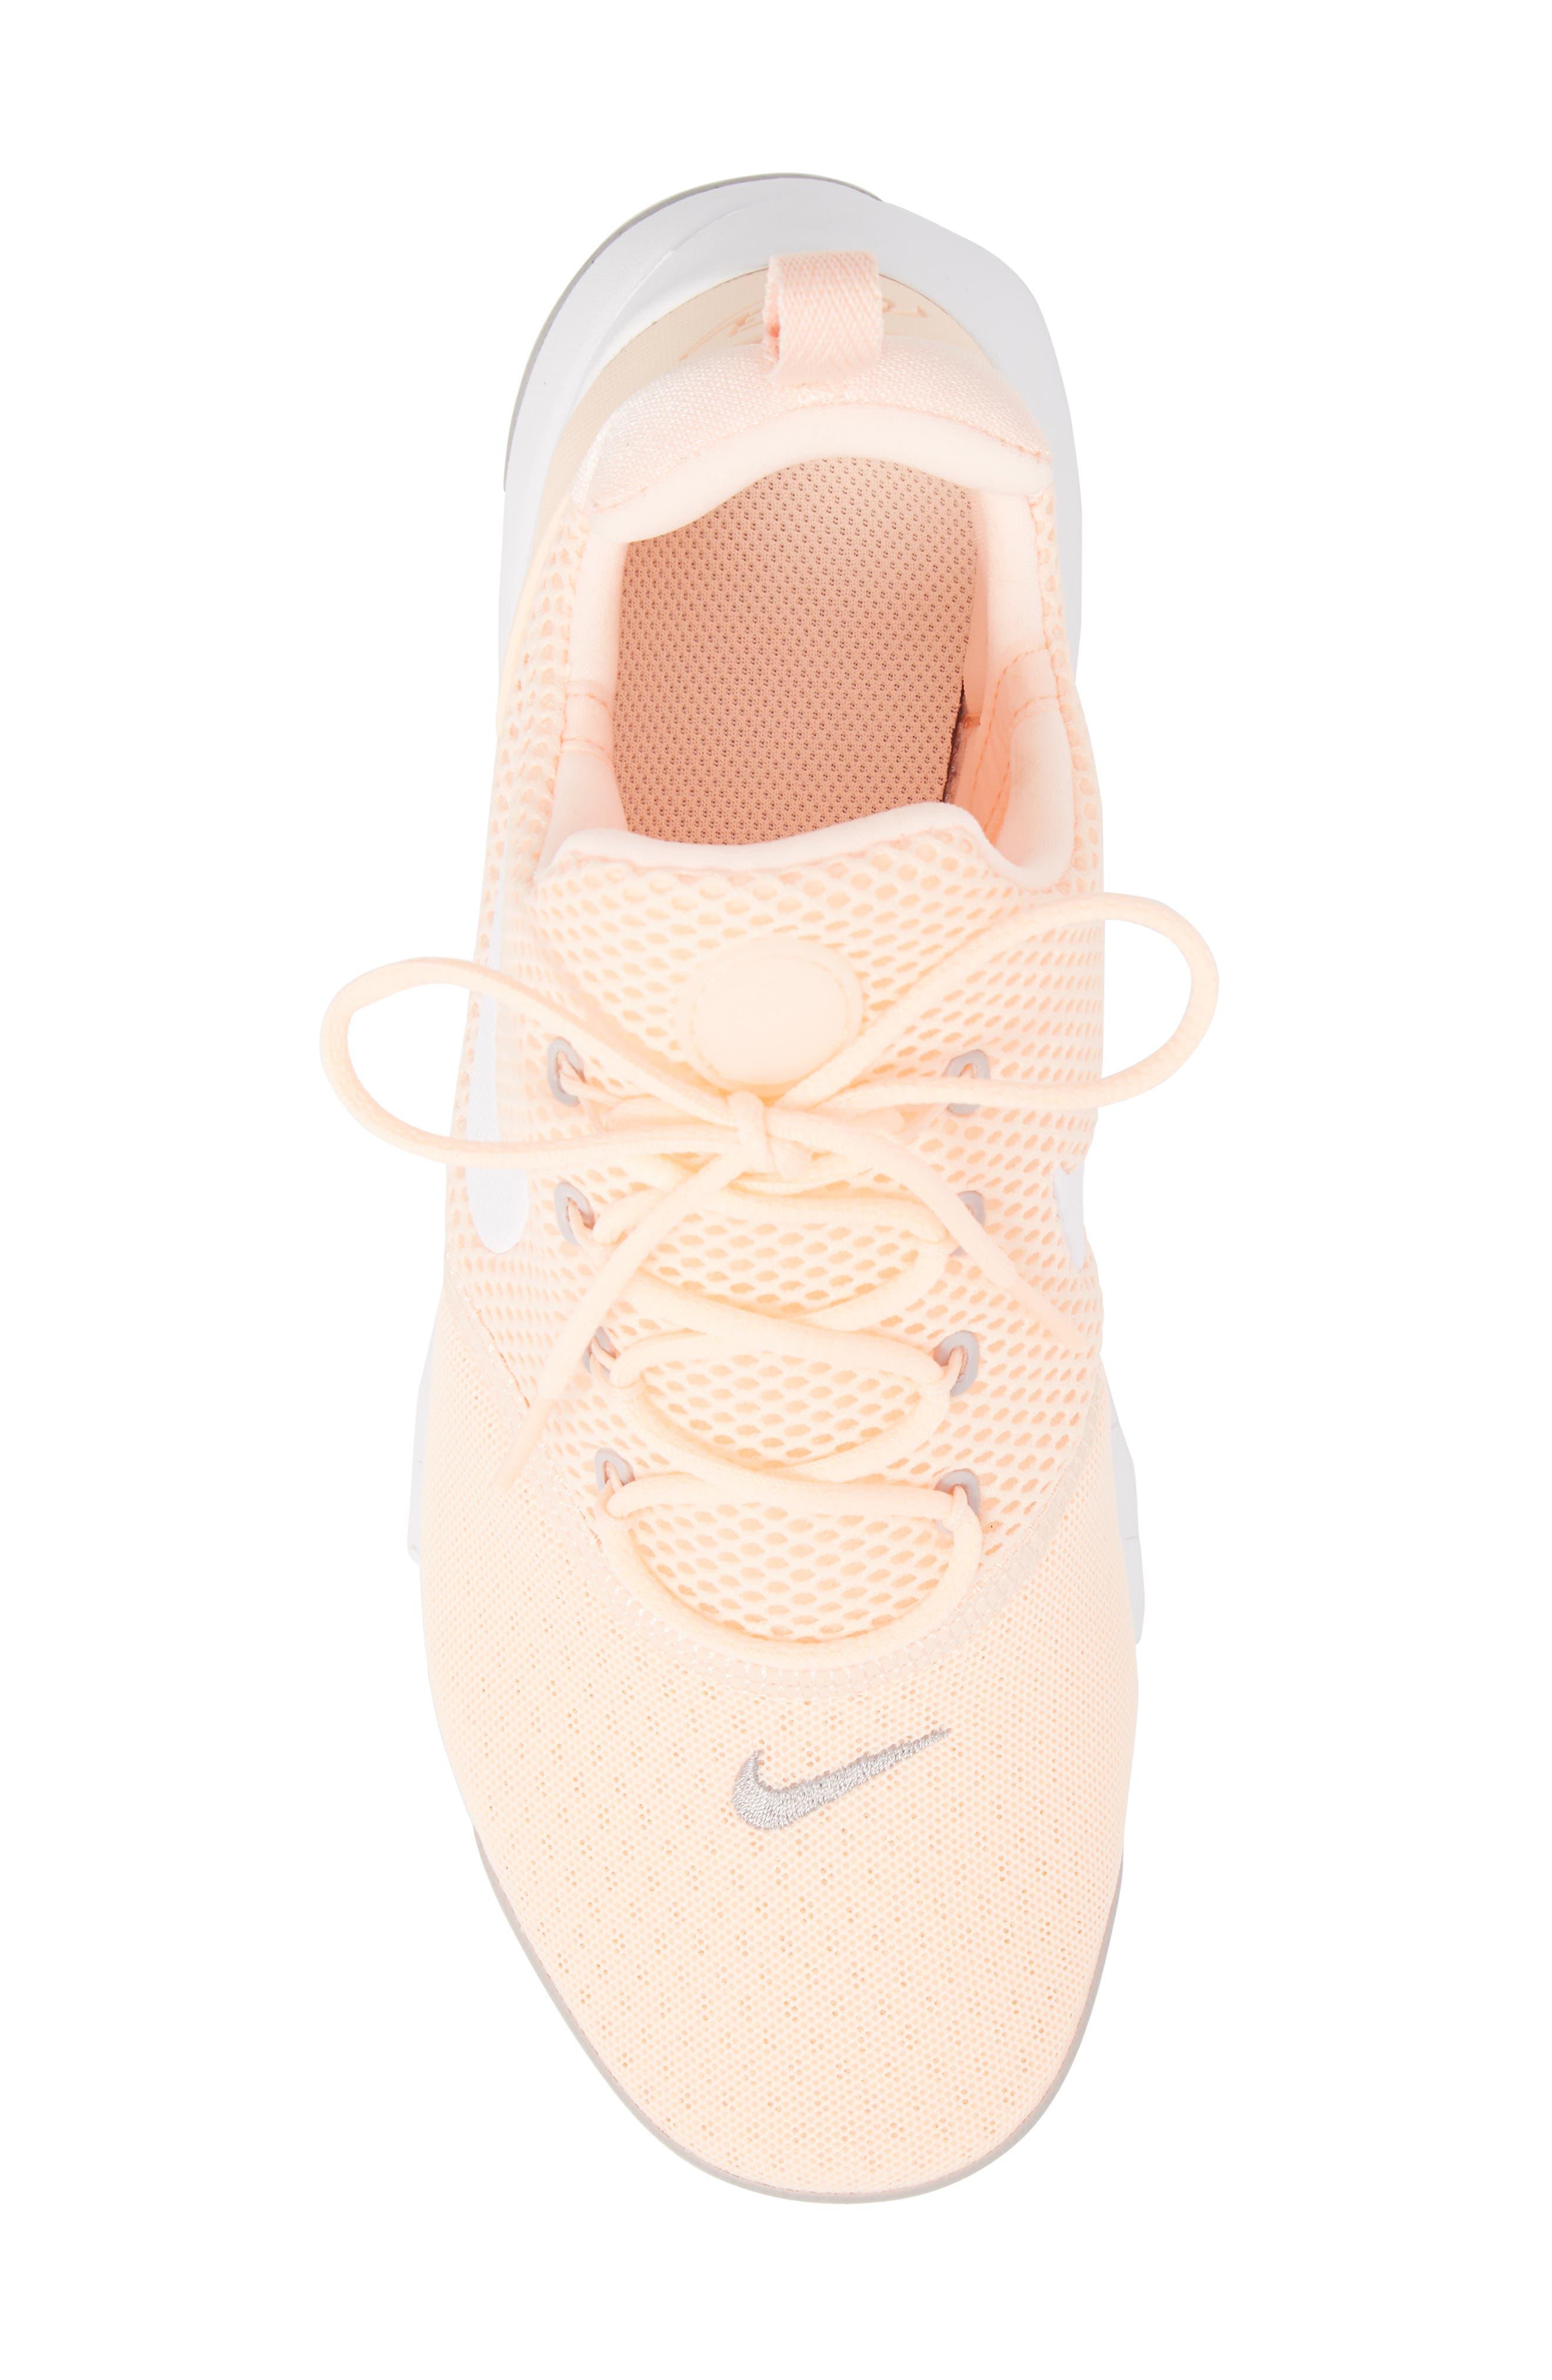 Presto Fly Sneaker,                             Alternate thumbnail 6, color,                             Crimson Tint/ White/ Grey